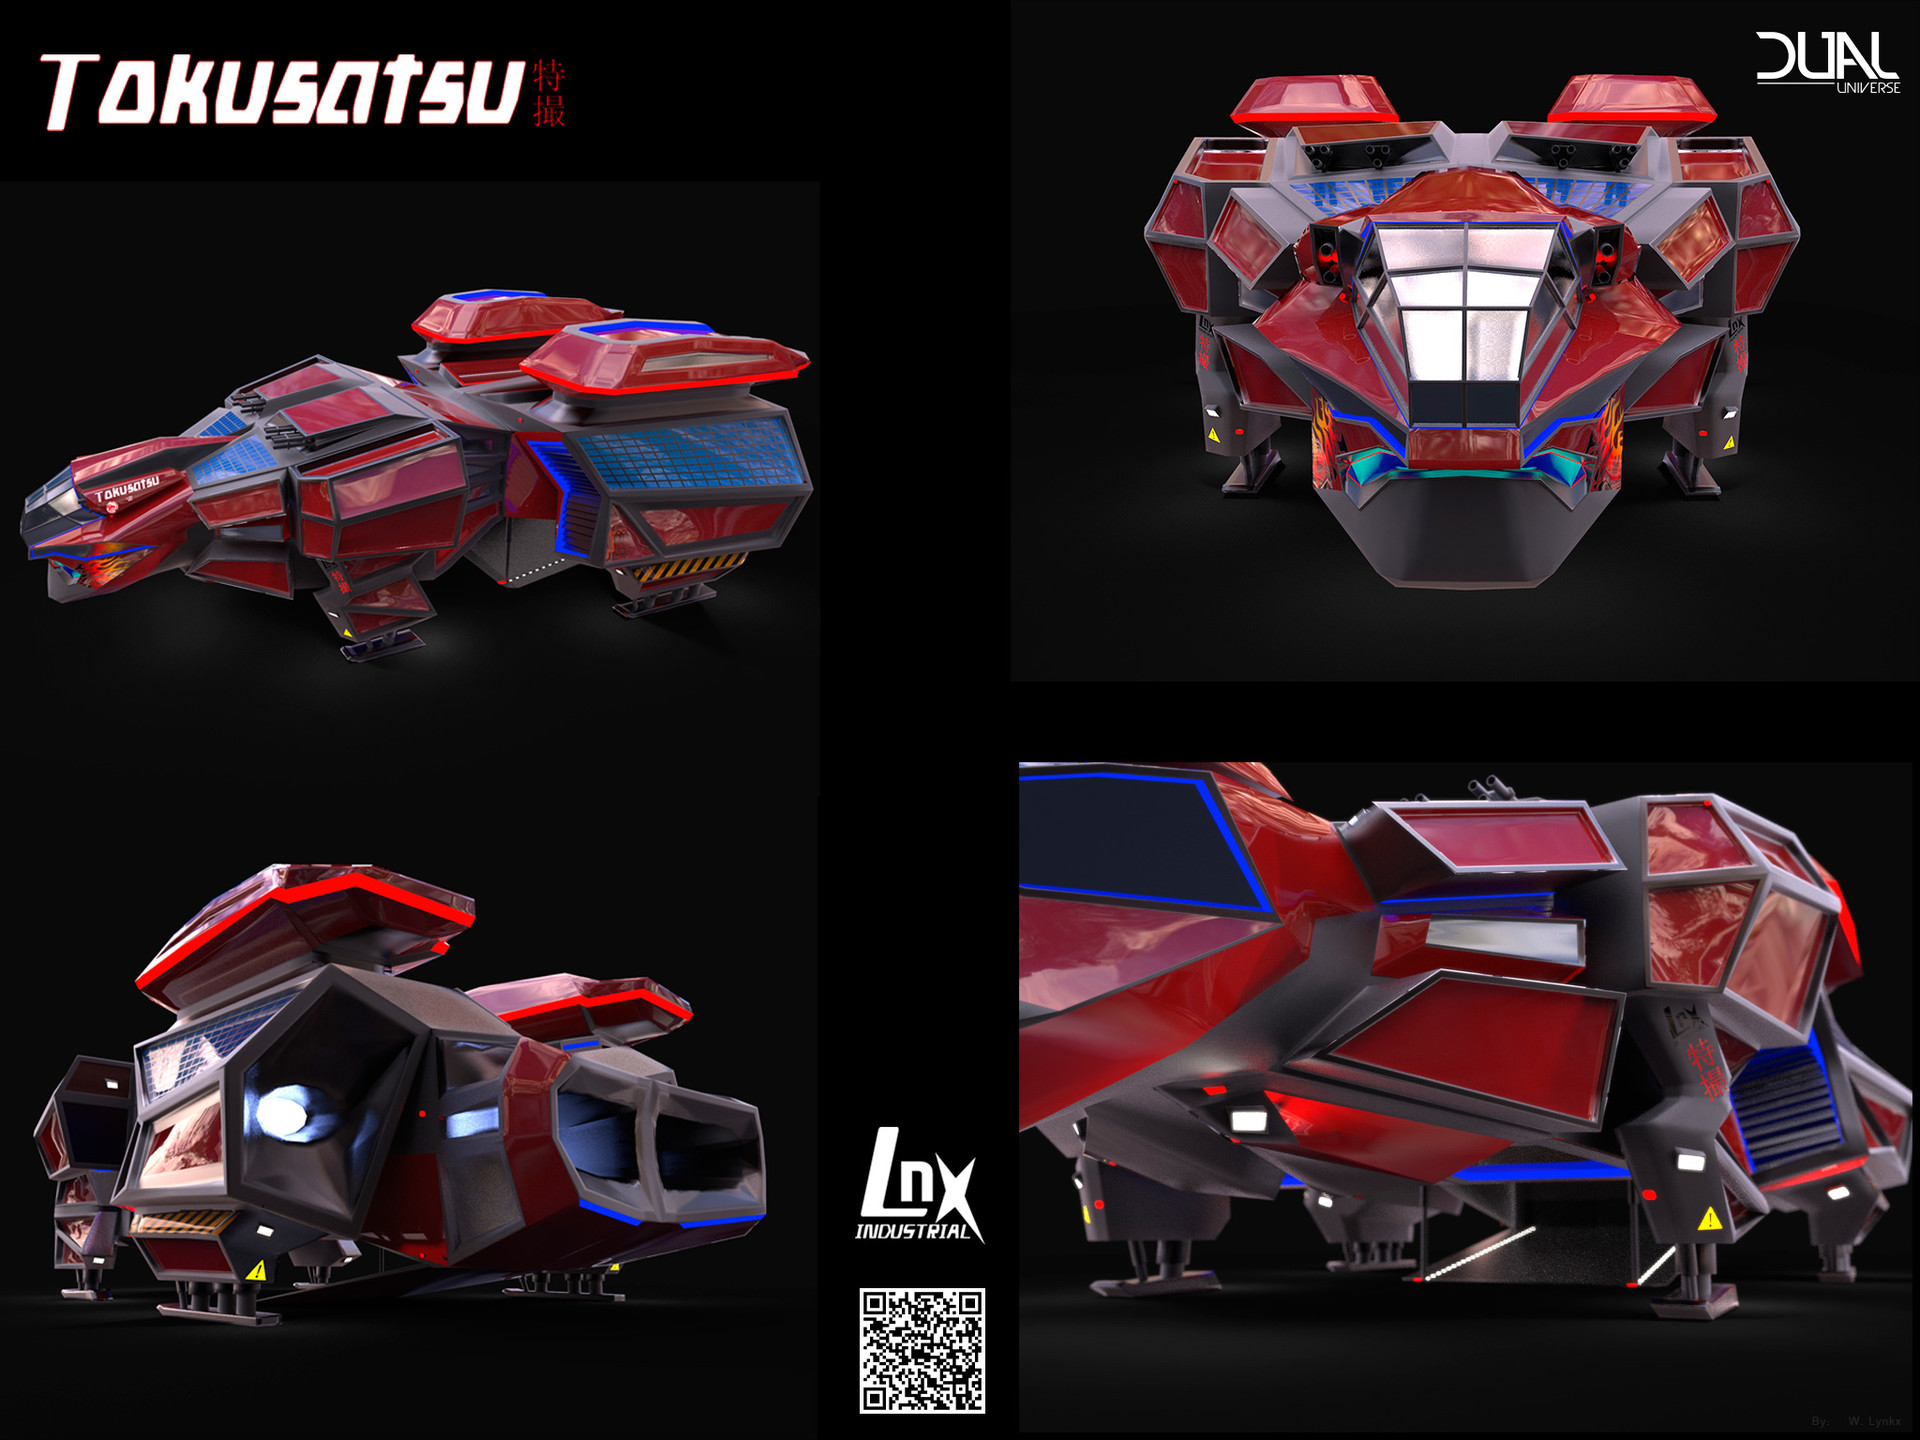 w-lynkx-ship-tokusatsu-009.jpg